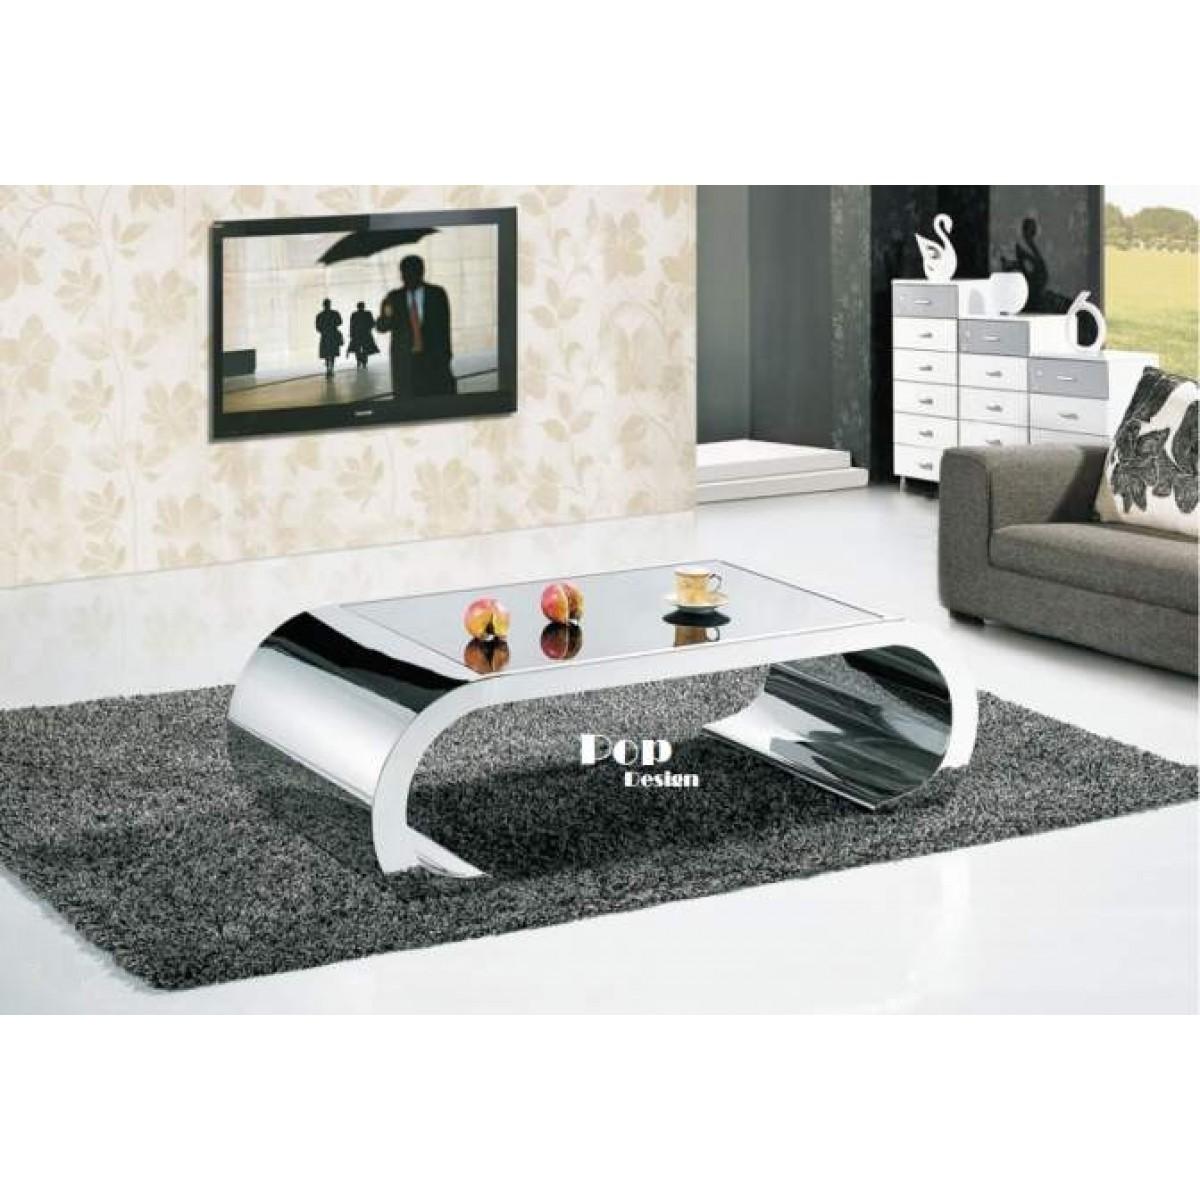 Table Basse Design En Verre Italien Atwebsterfr Maison Et Mobilier